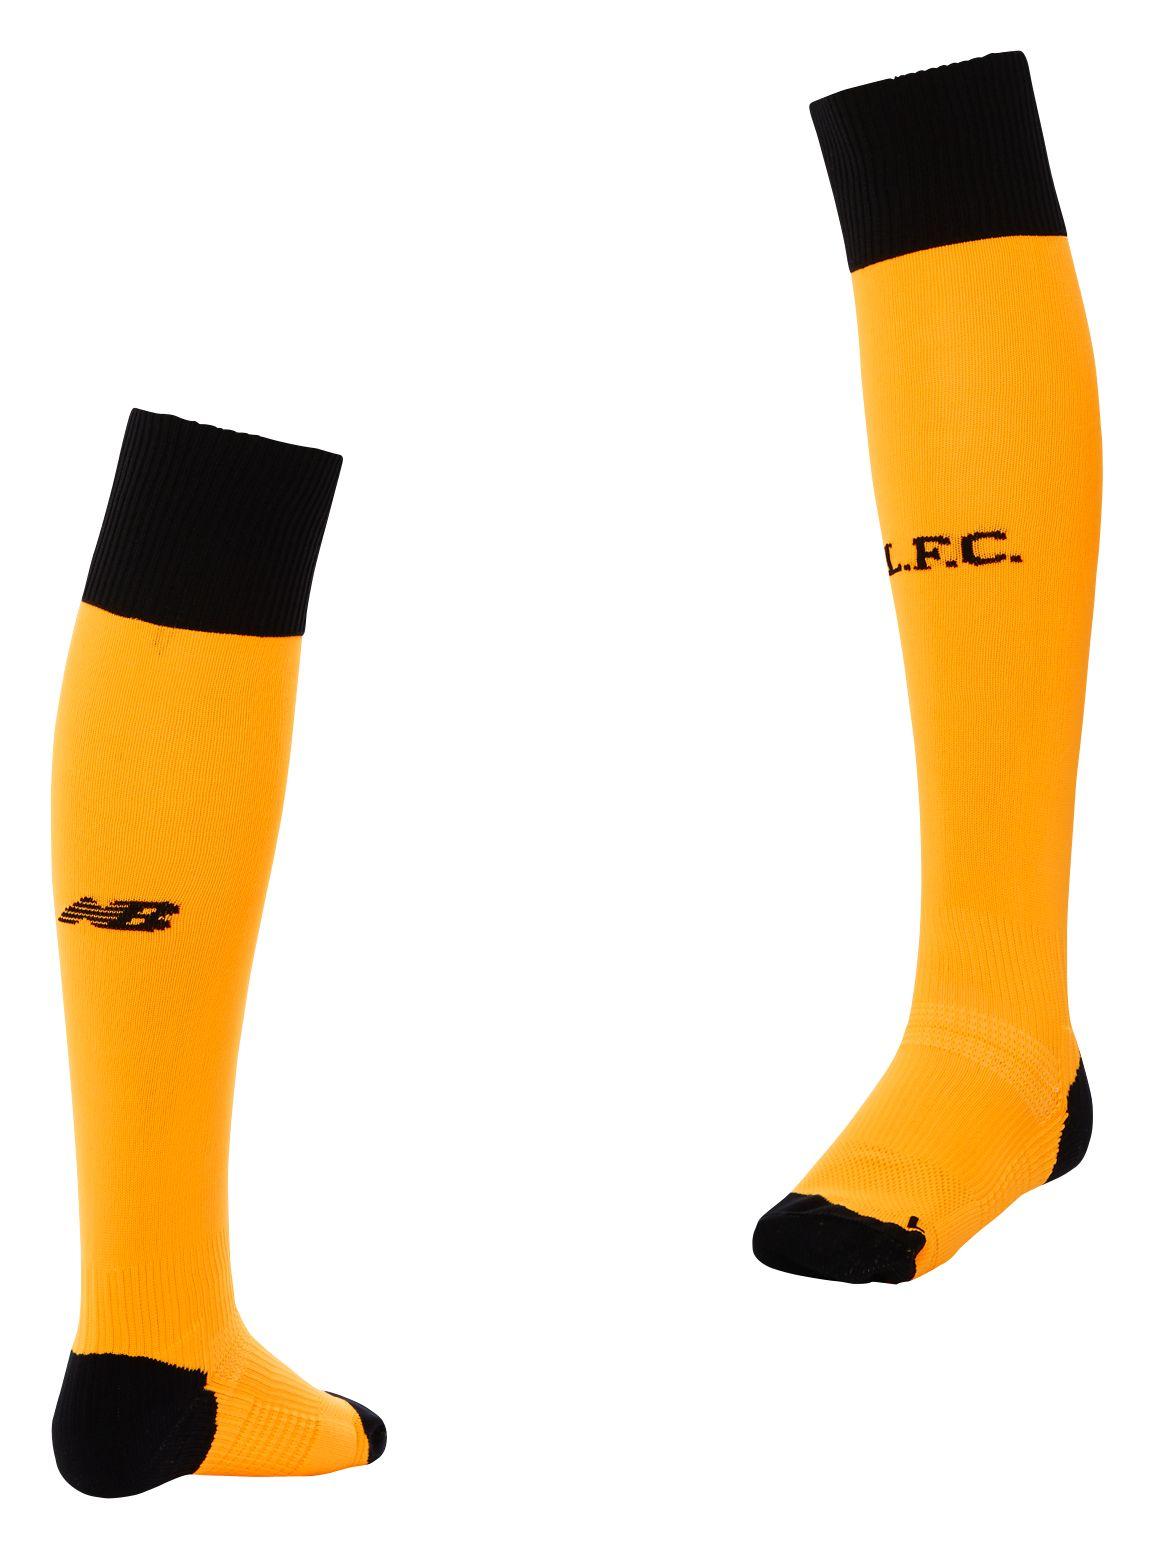 New Balance : LFC Mens Away GK Sock : Men's 2016/17 Away Kit : MA630004IPS